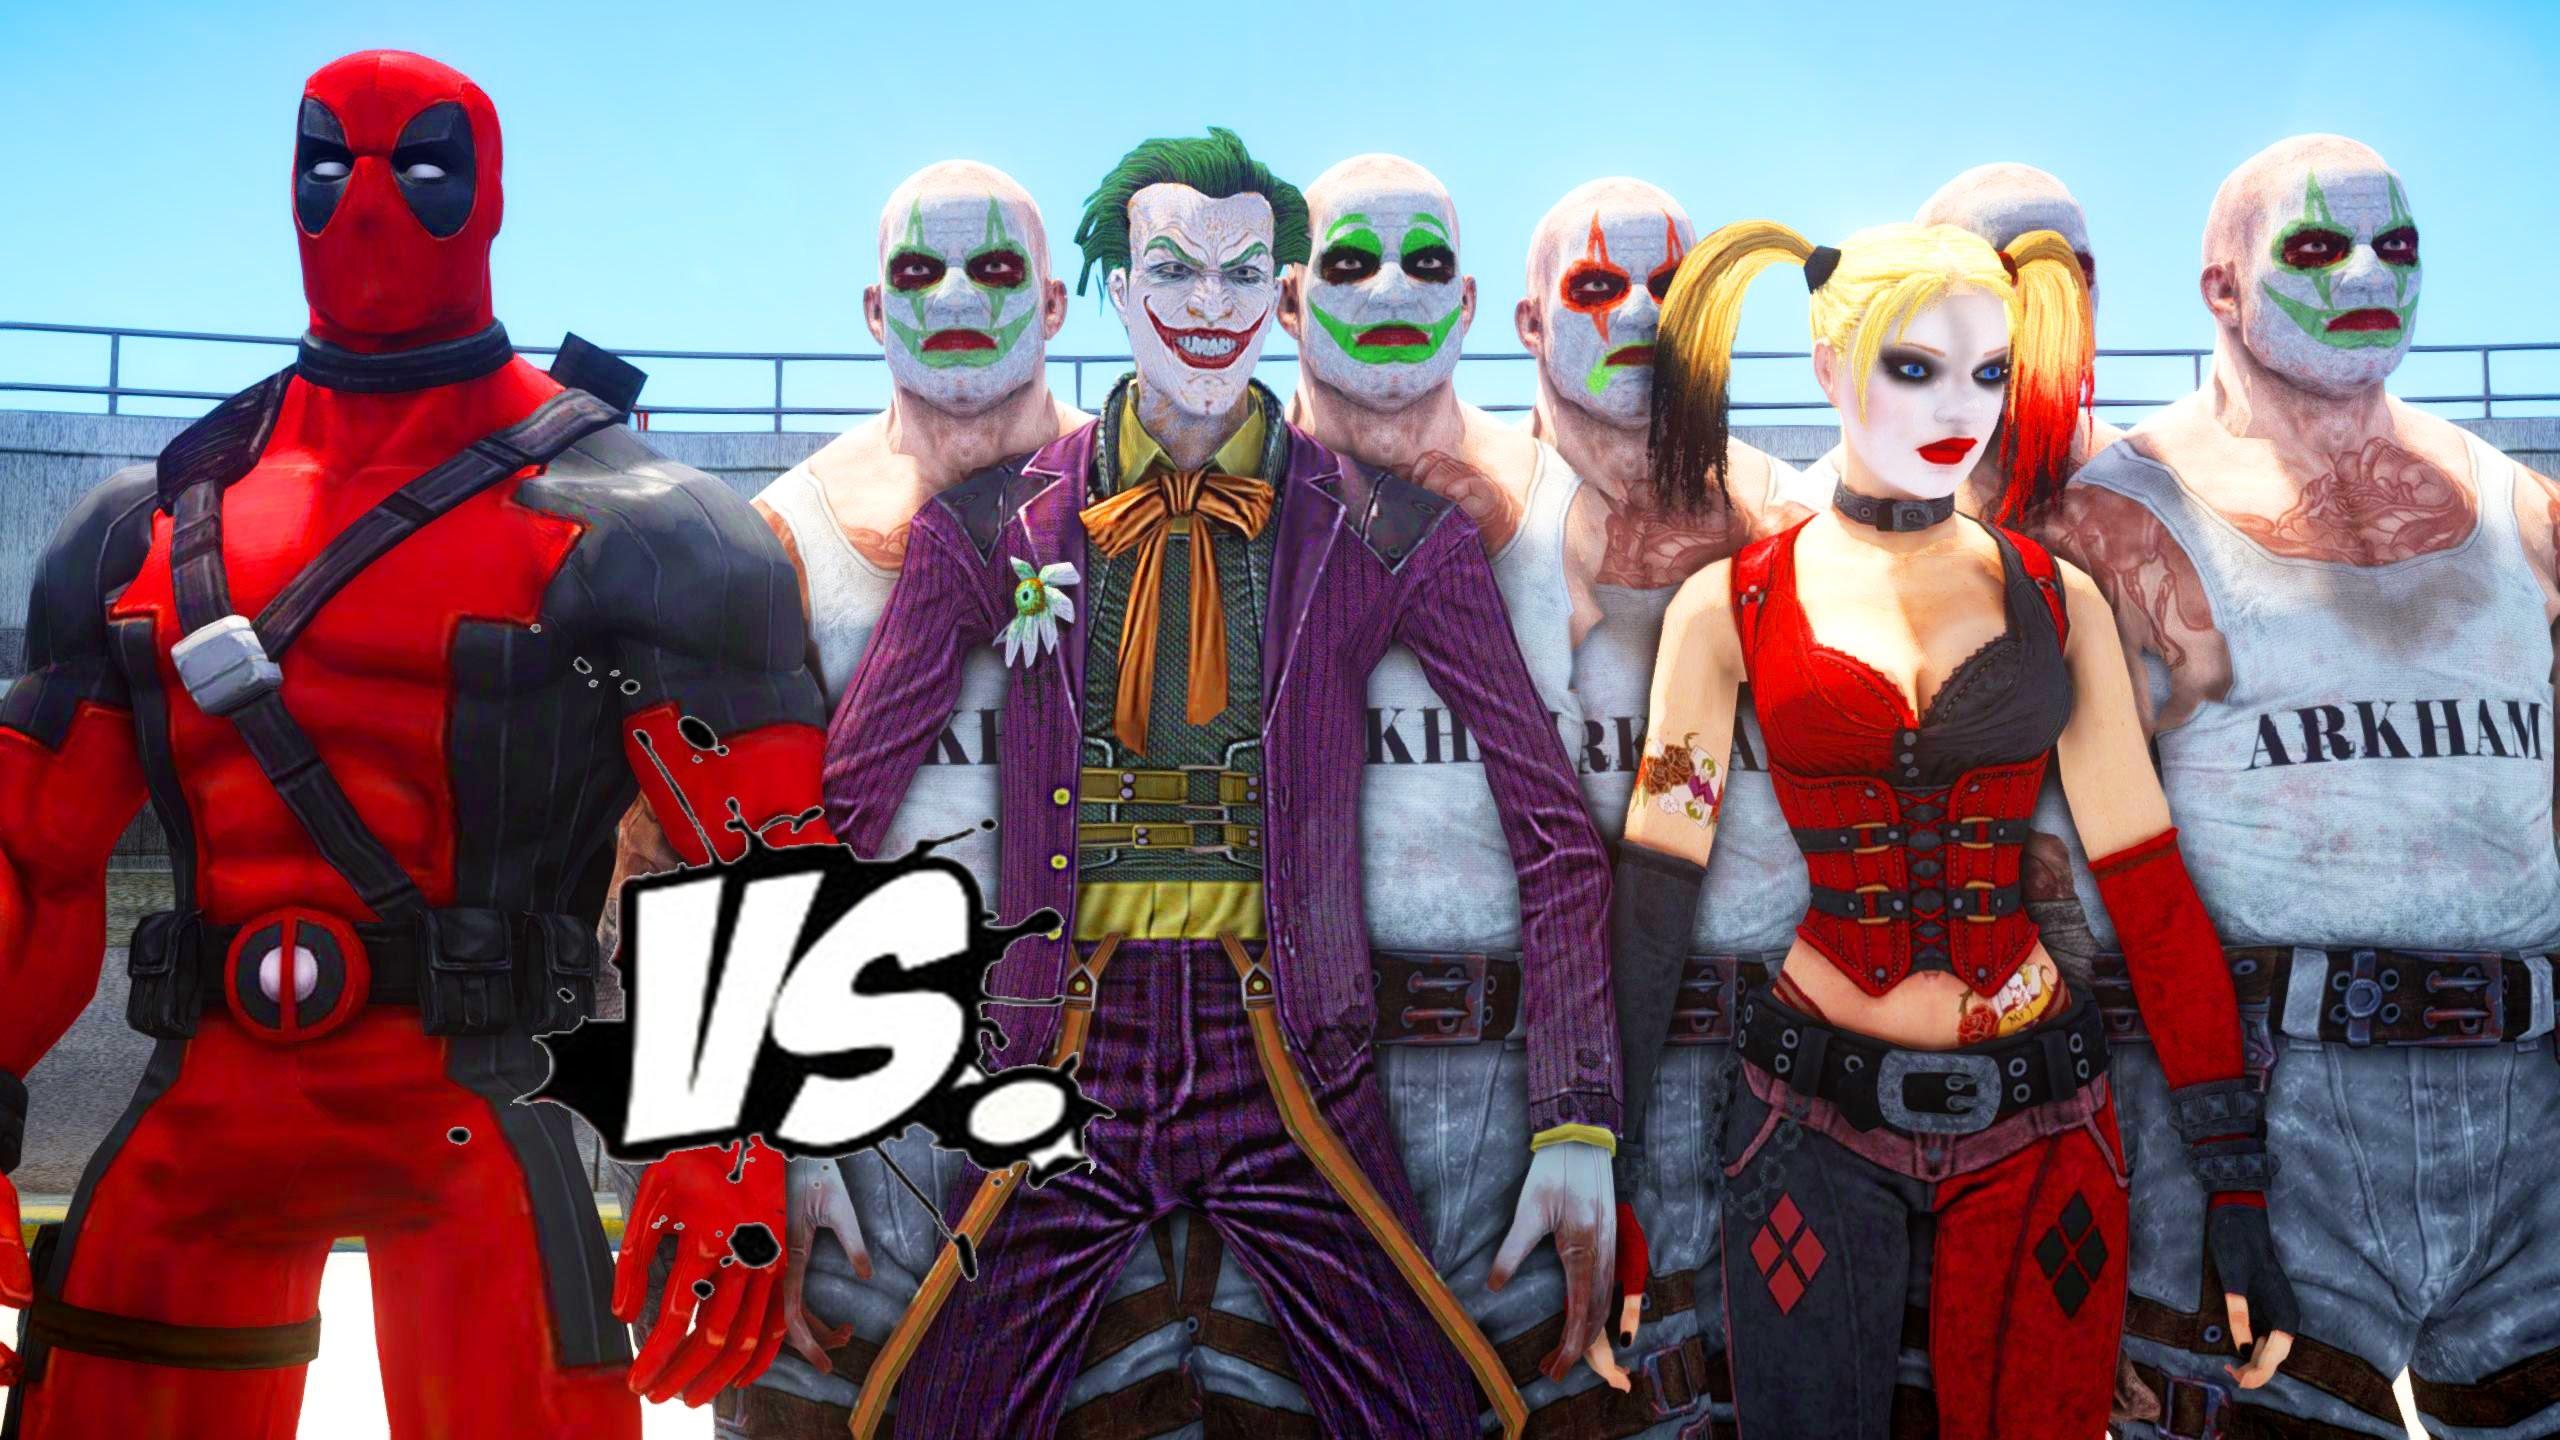 DEADPOOL VS JOKER & HARLEY QUINN – EPIC SUPERHEROES BATTLE | DEATH FIGHT –  YouTube